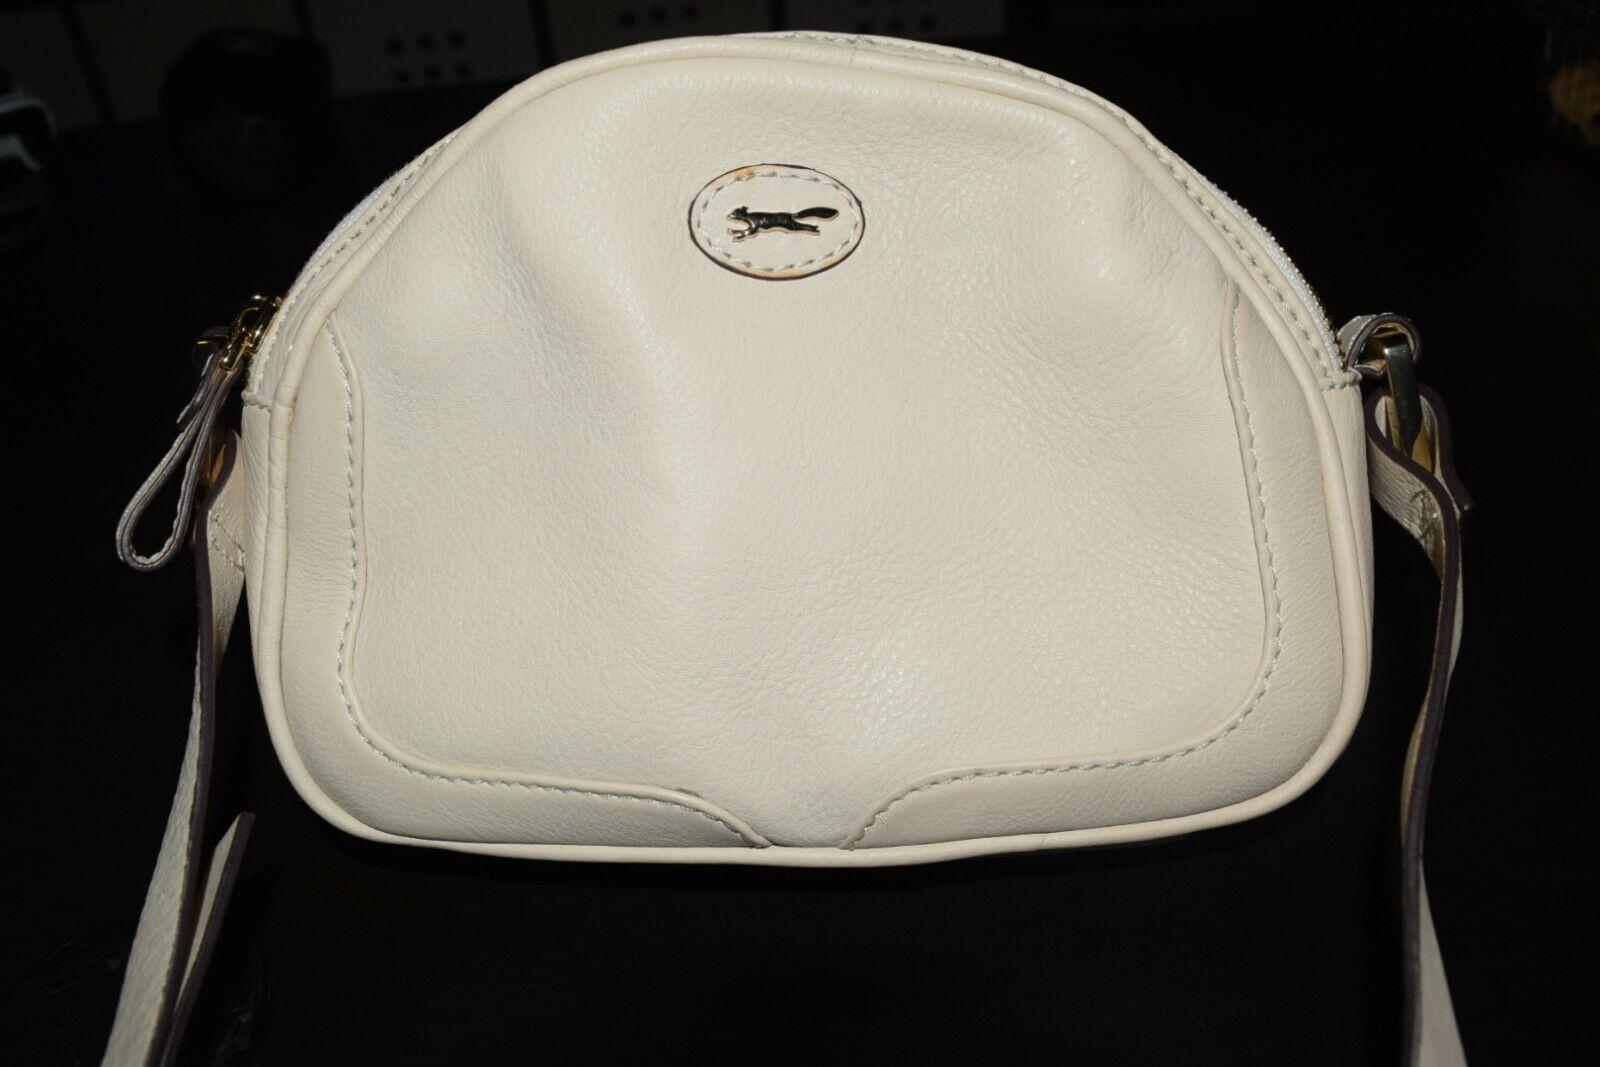 Authentic Paul Costelloe Handbag Purse Cream Brand New Ivory Cross Body Bag